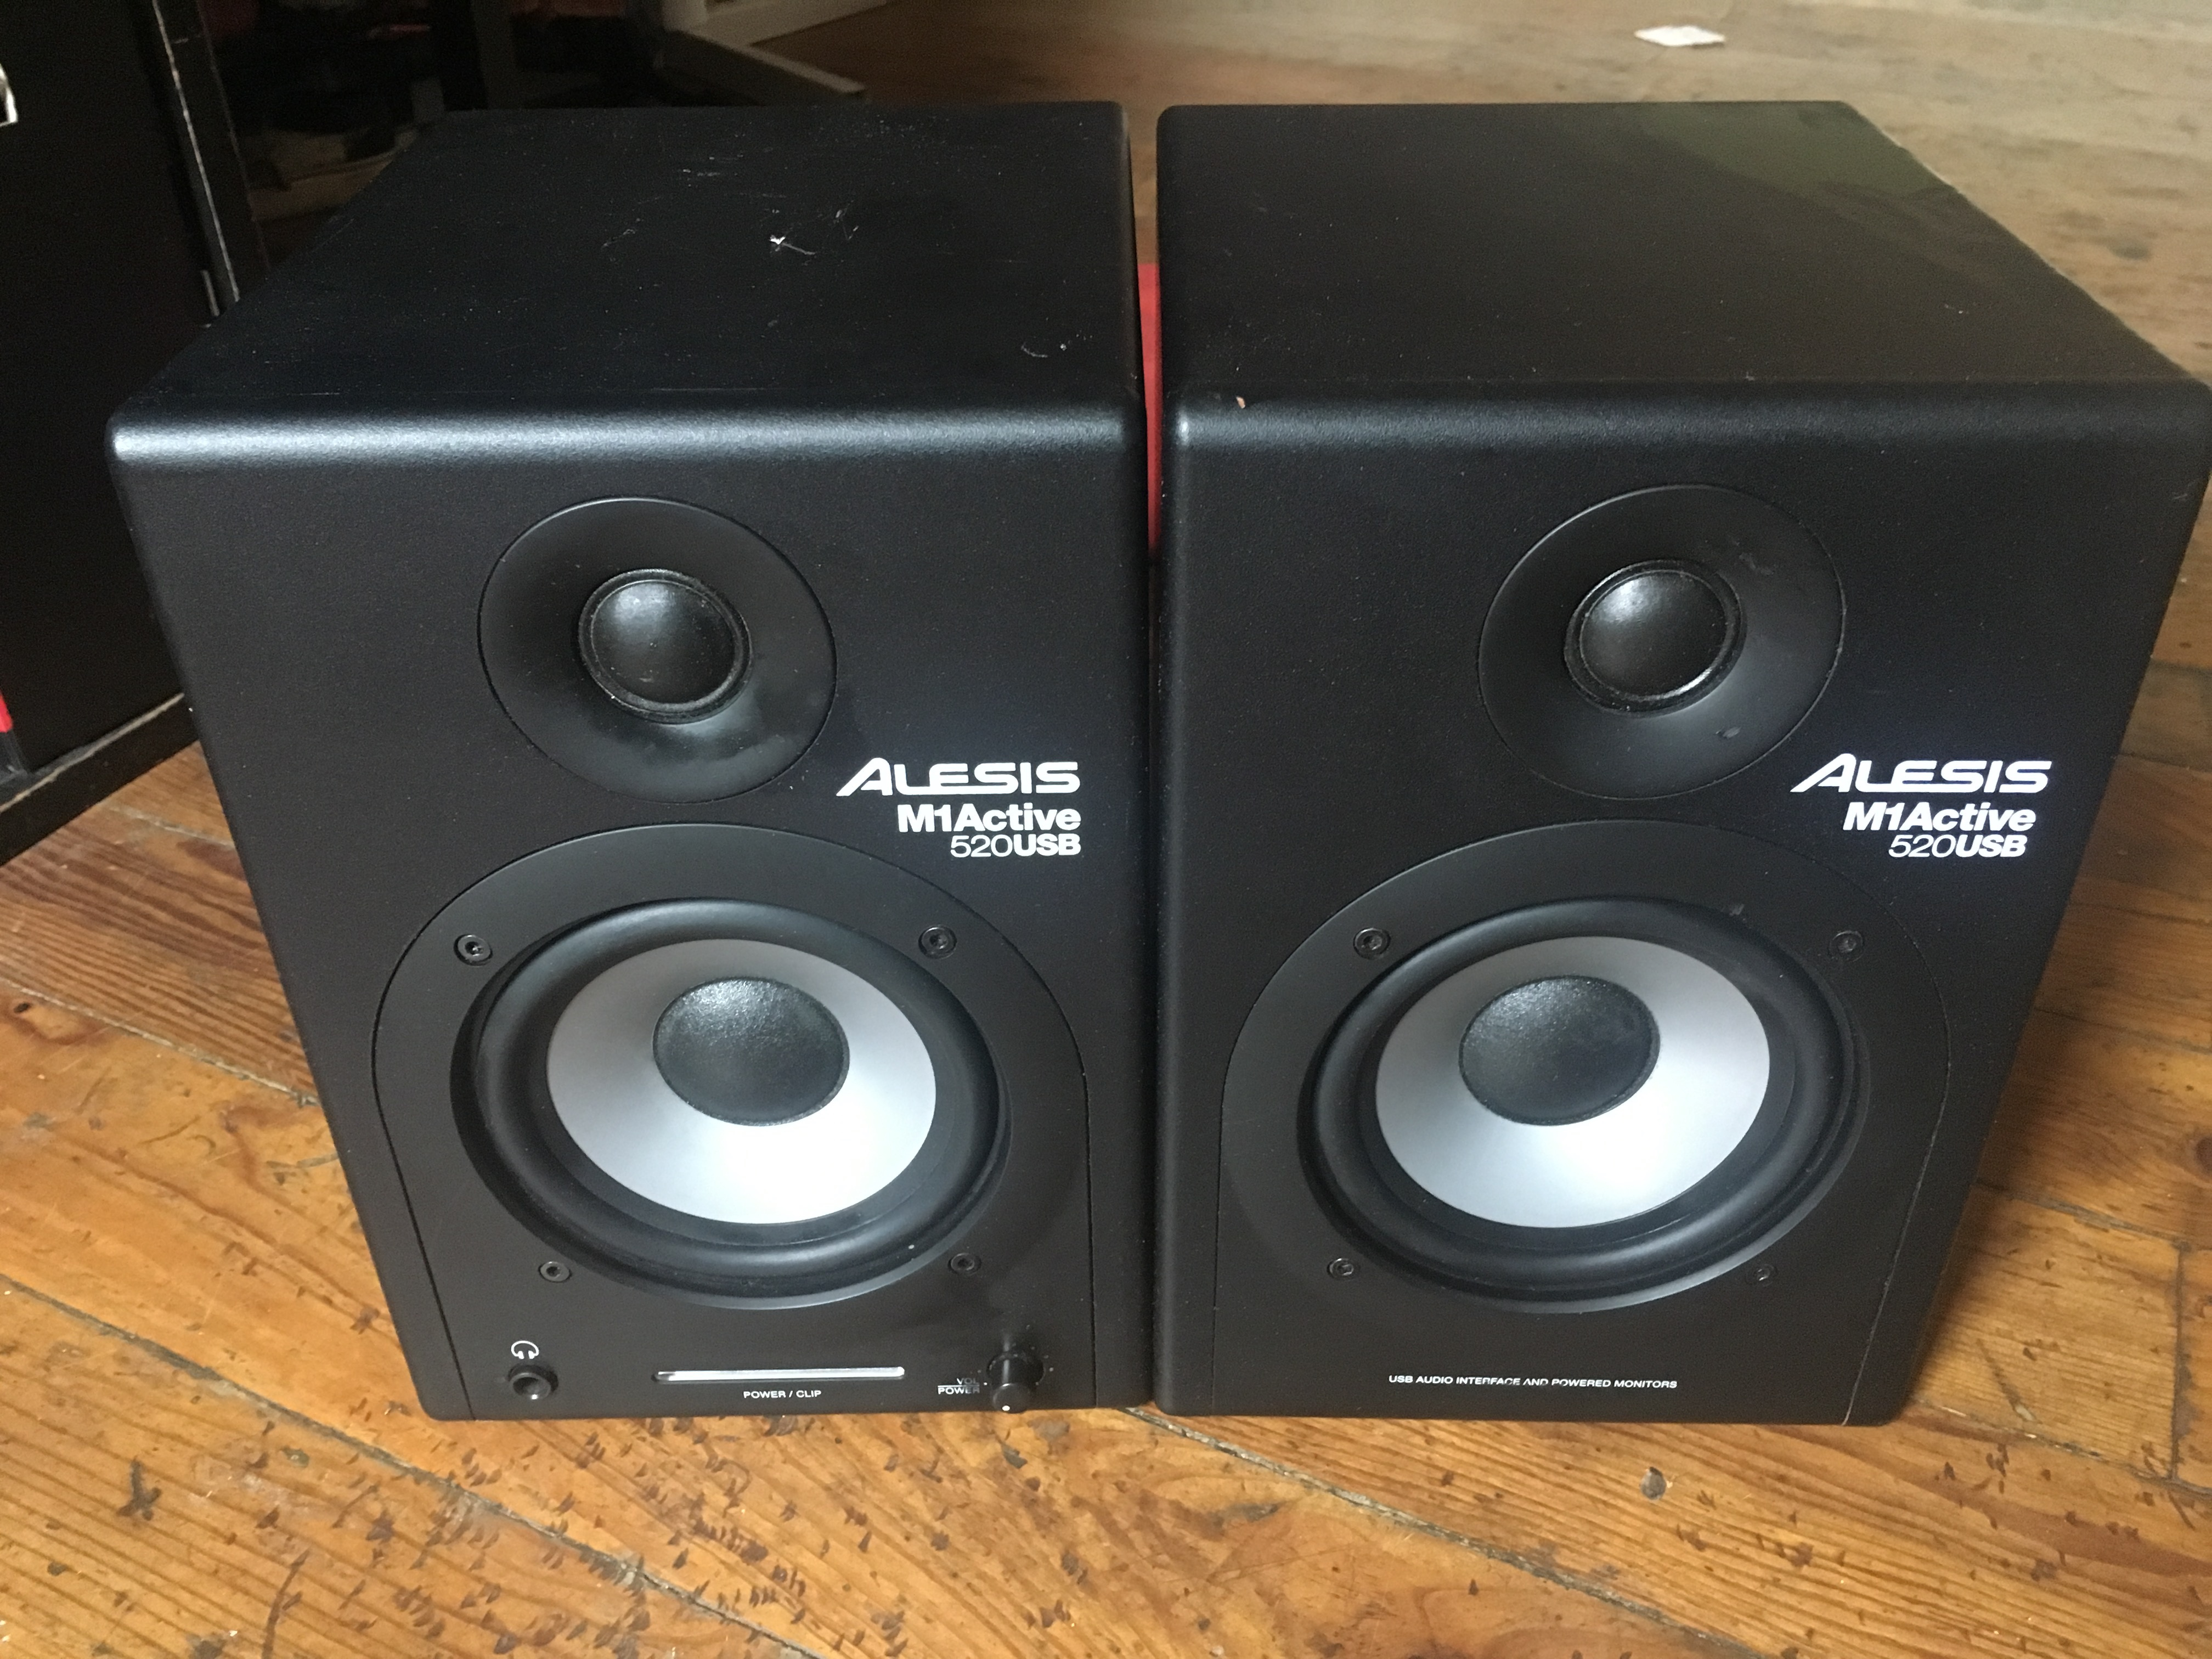 Alesis M1 Active 520 : alesis m1 active 520 usb image 1535608 audiofanzine ~ Hamham.info Haus und Dekorationen